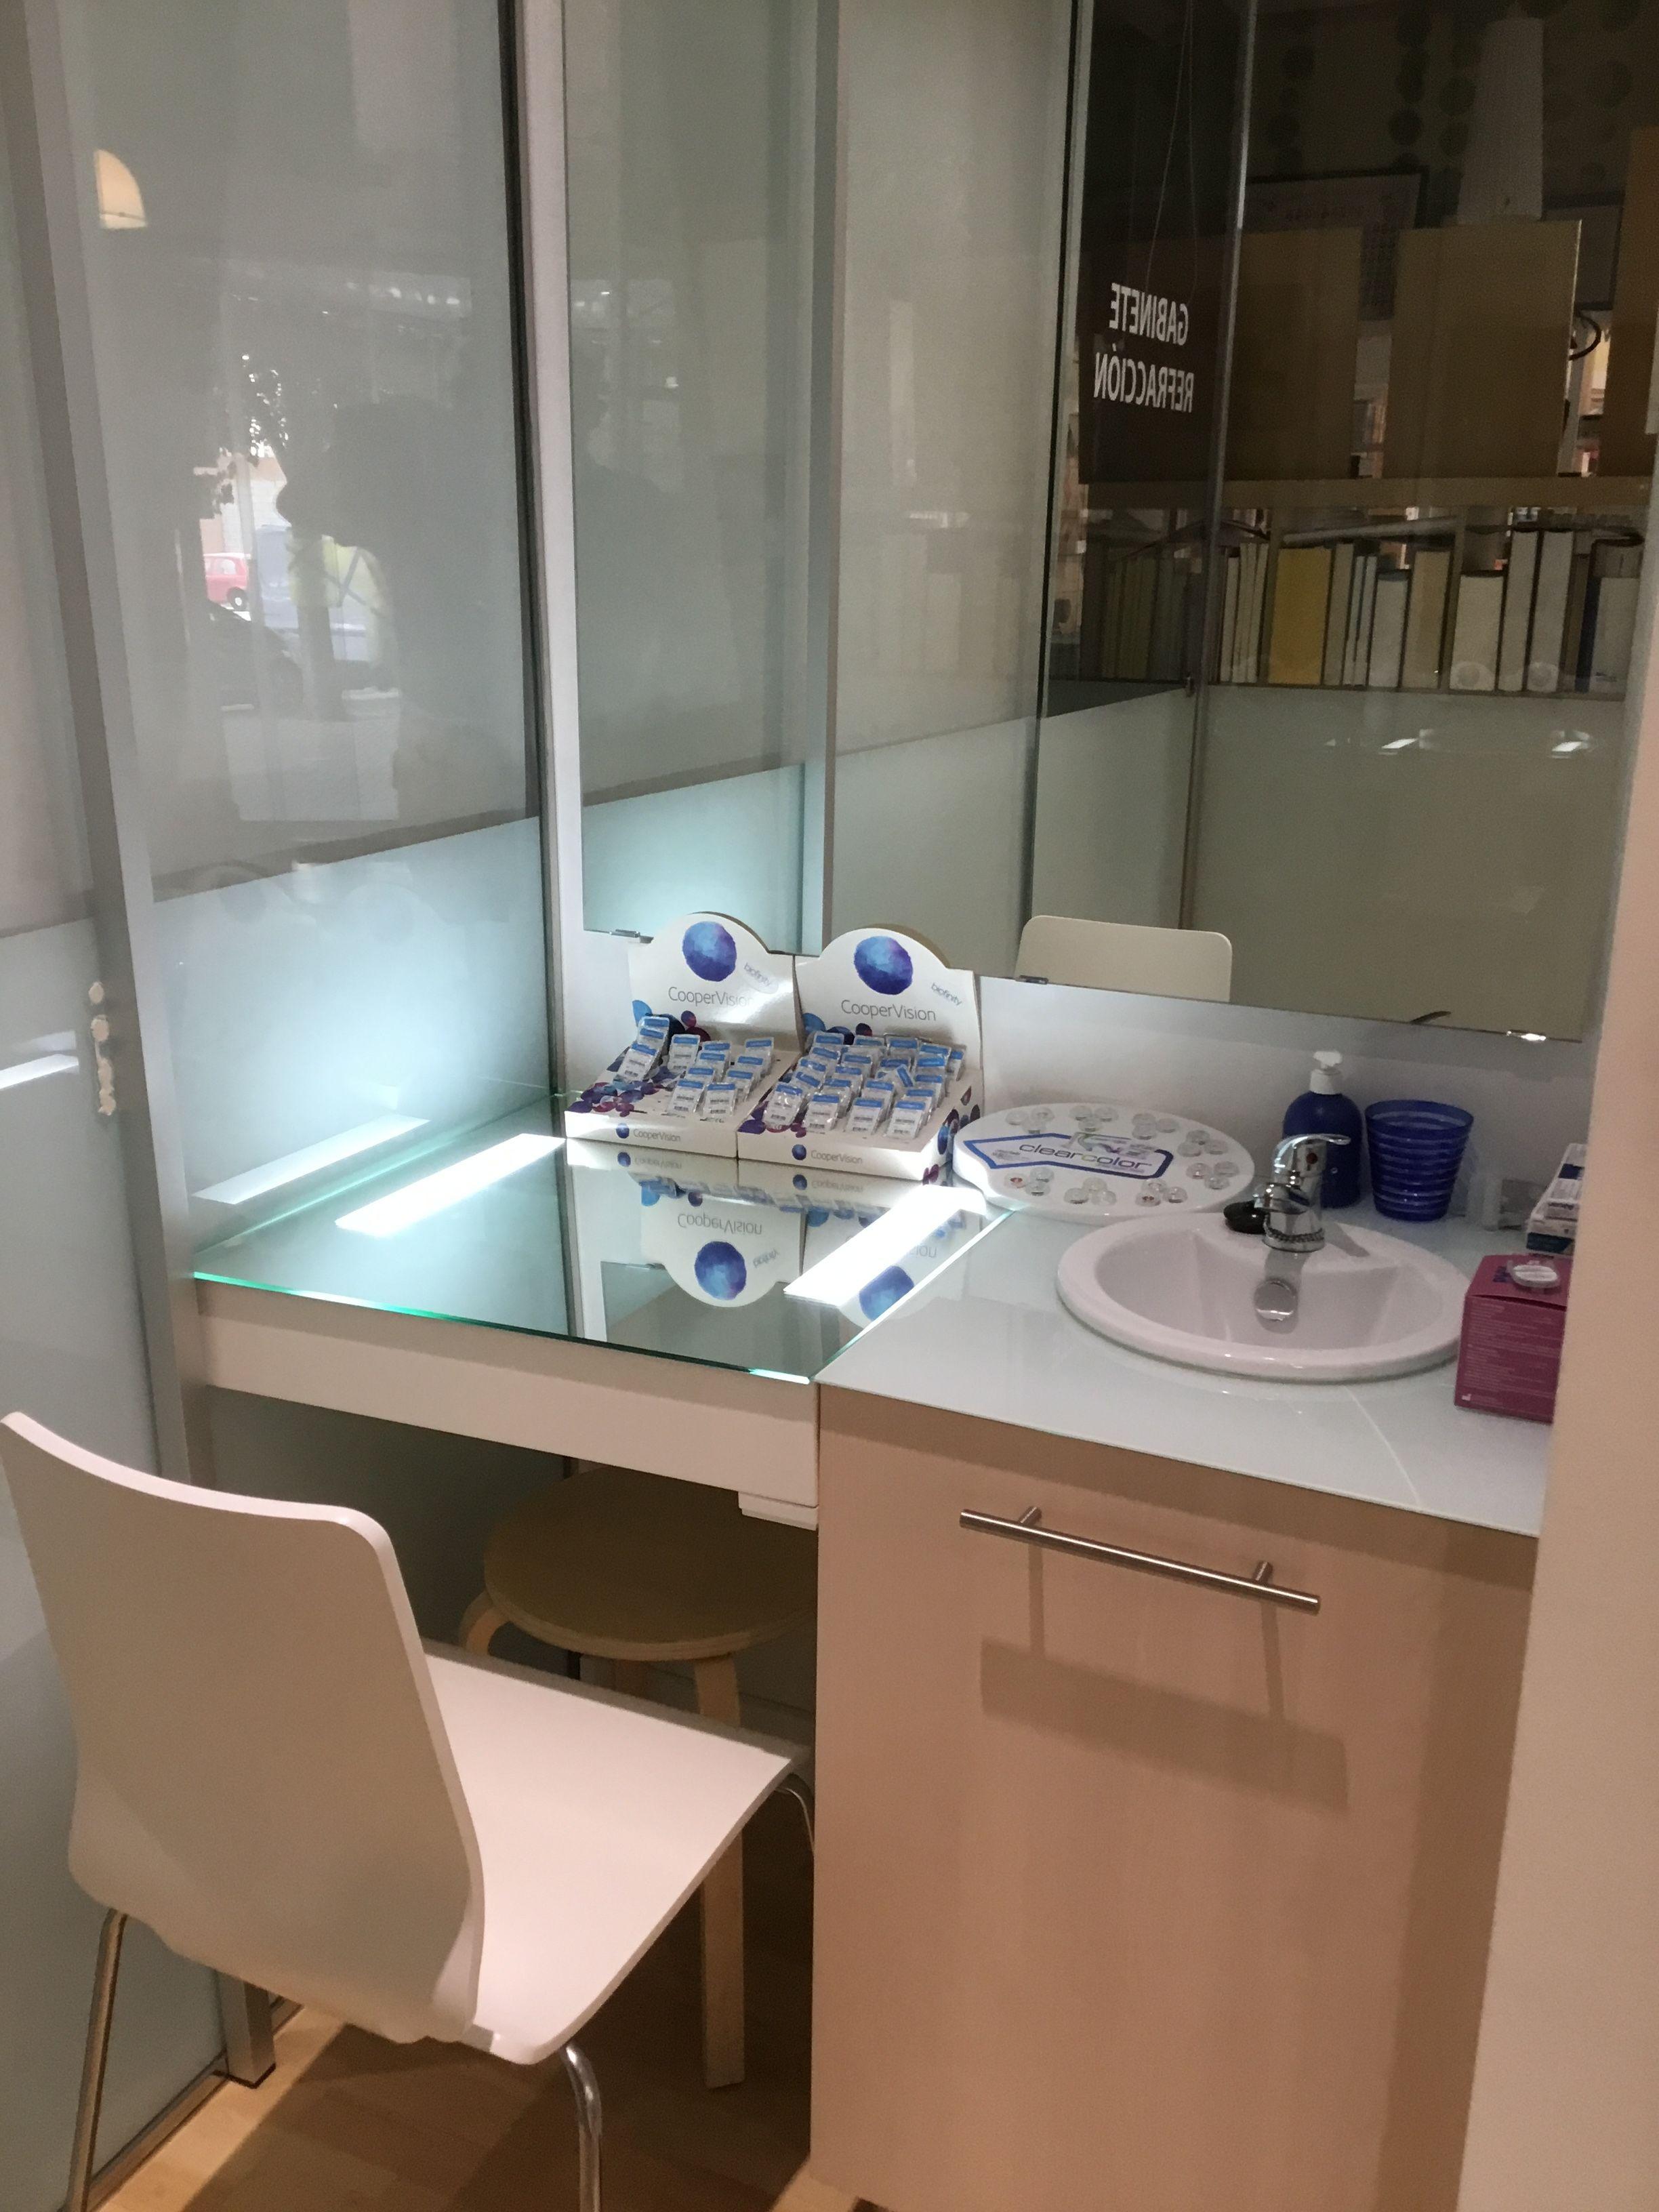 Farmacia con venta de lentes de contacto en Sevilla